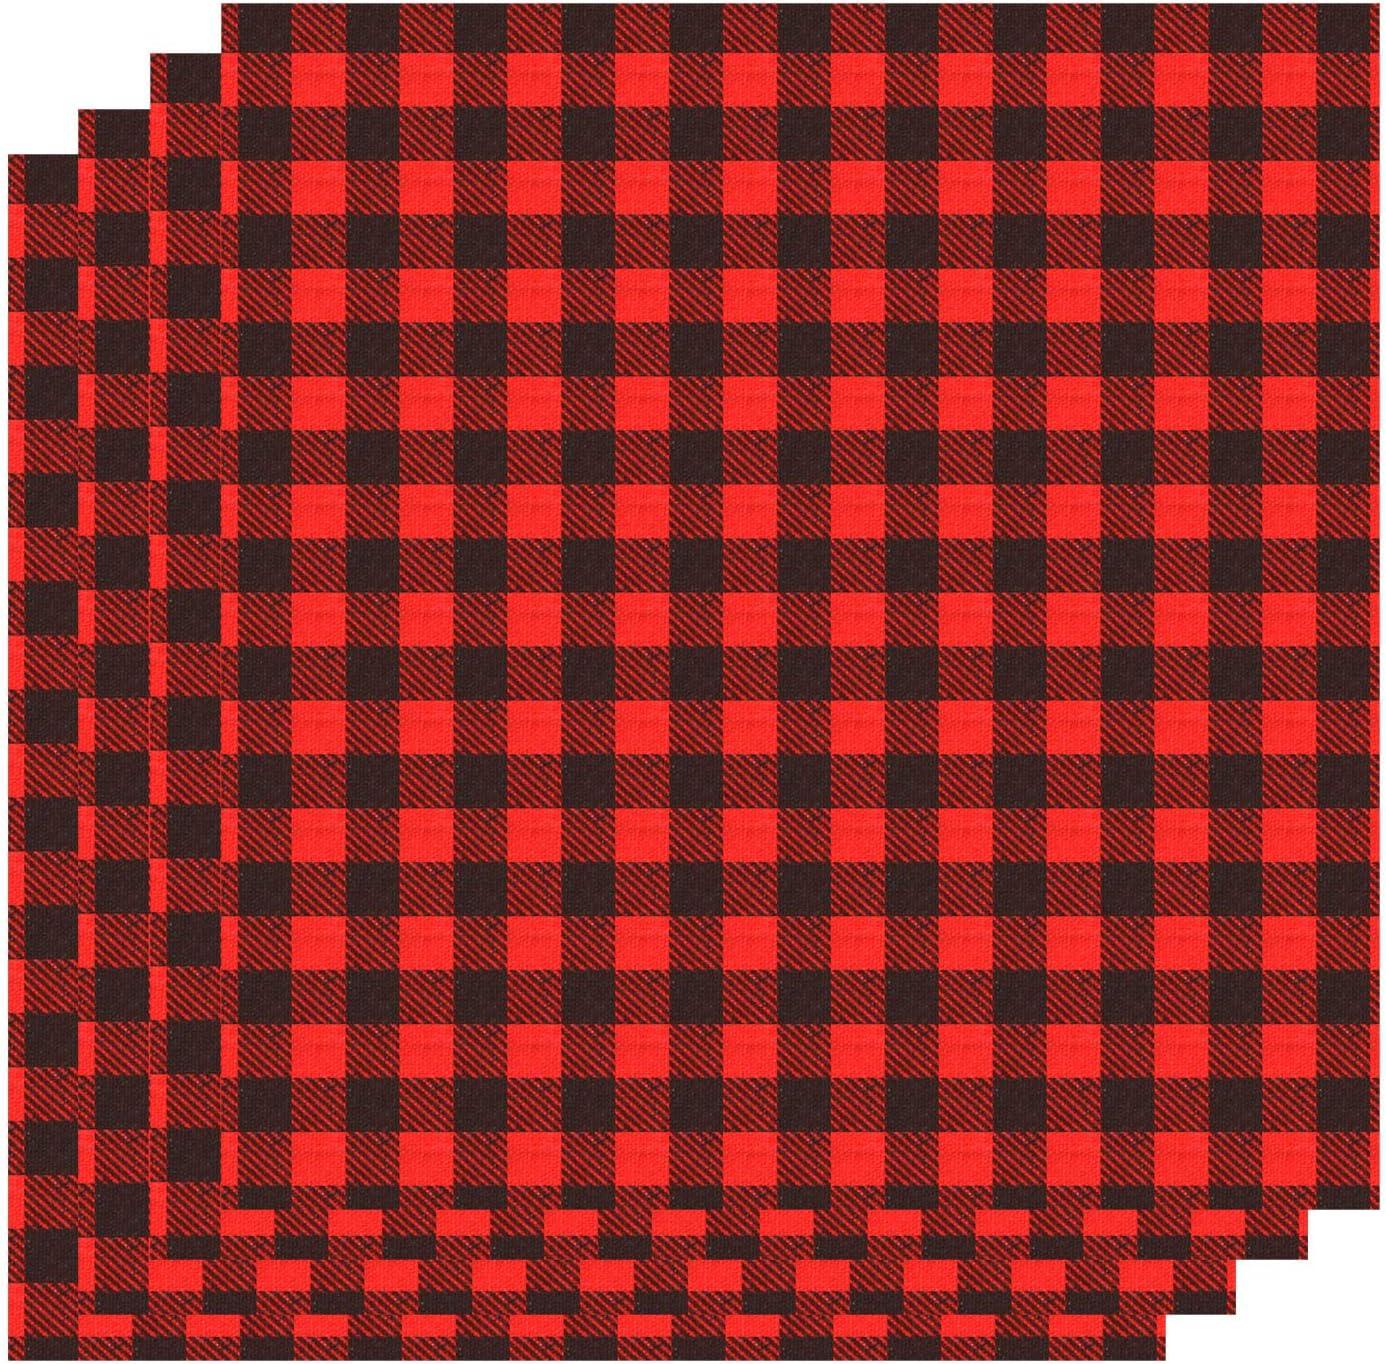 White//Black 4-12x12 Bundle Red Black Buffalo Check Heat Transfer Vinyl Black and White Buffalo Plaid HTV